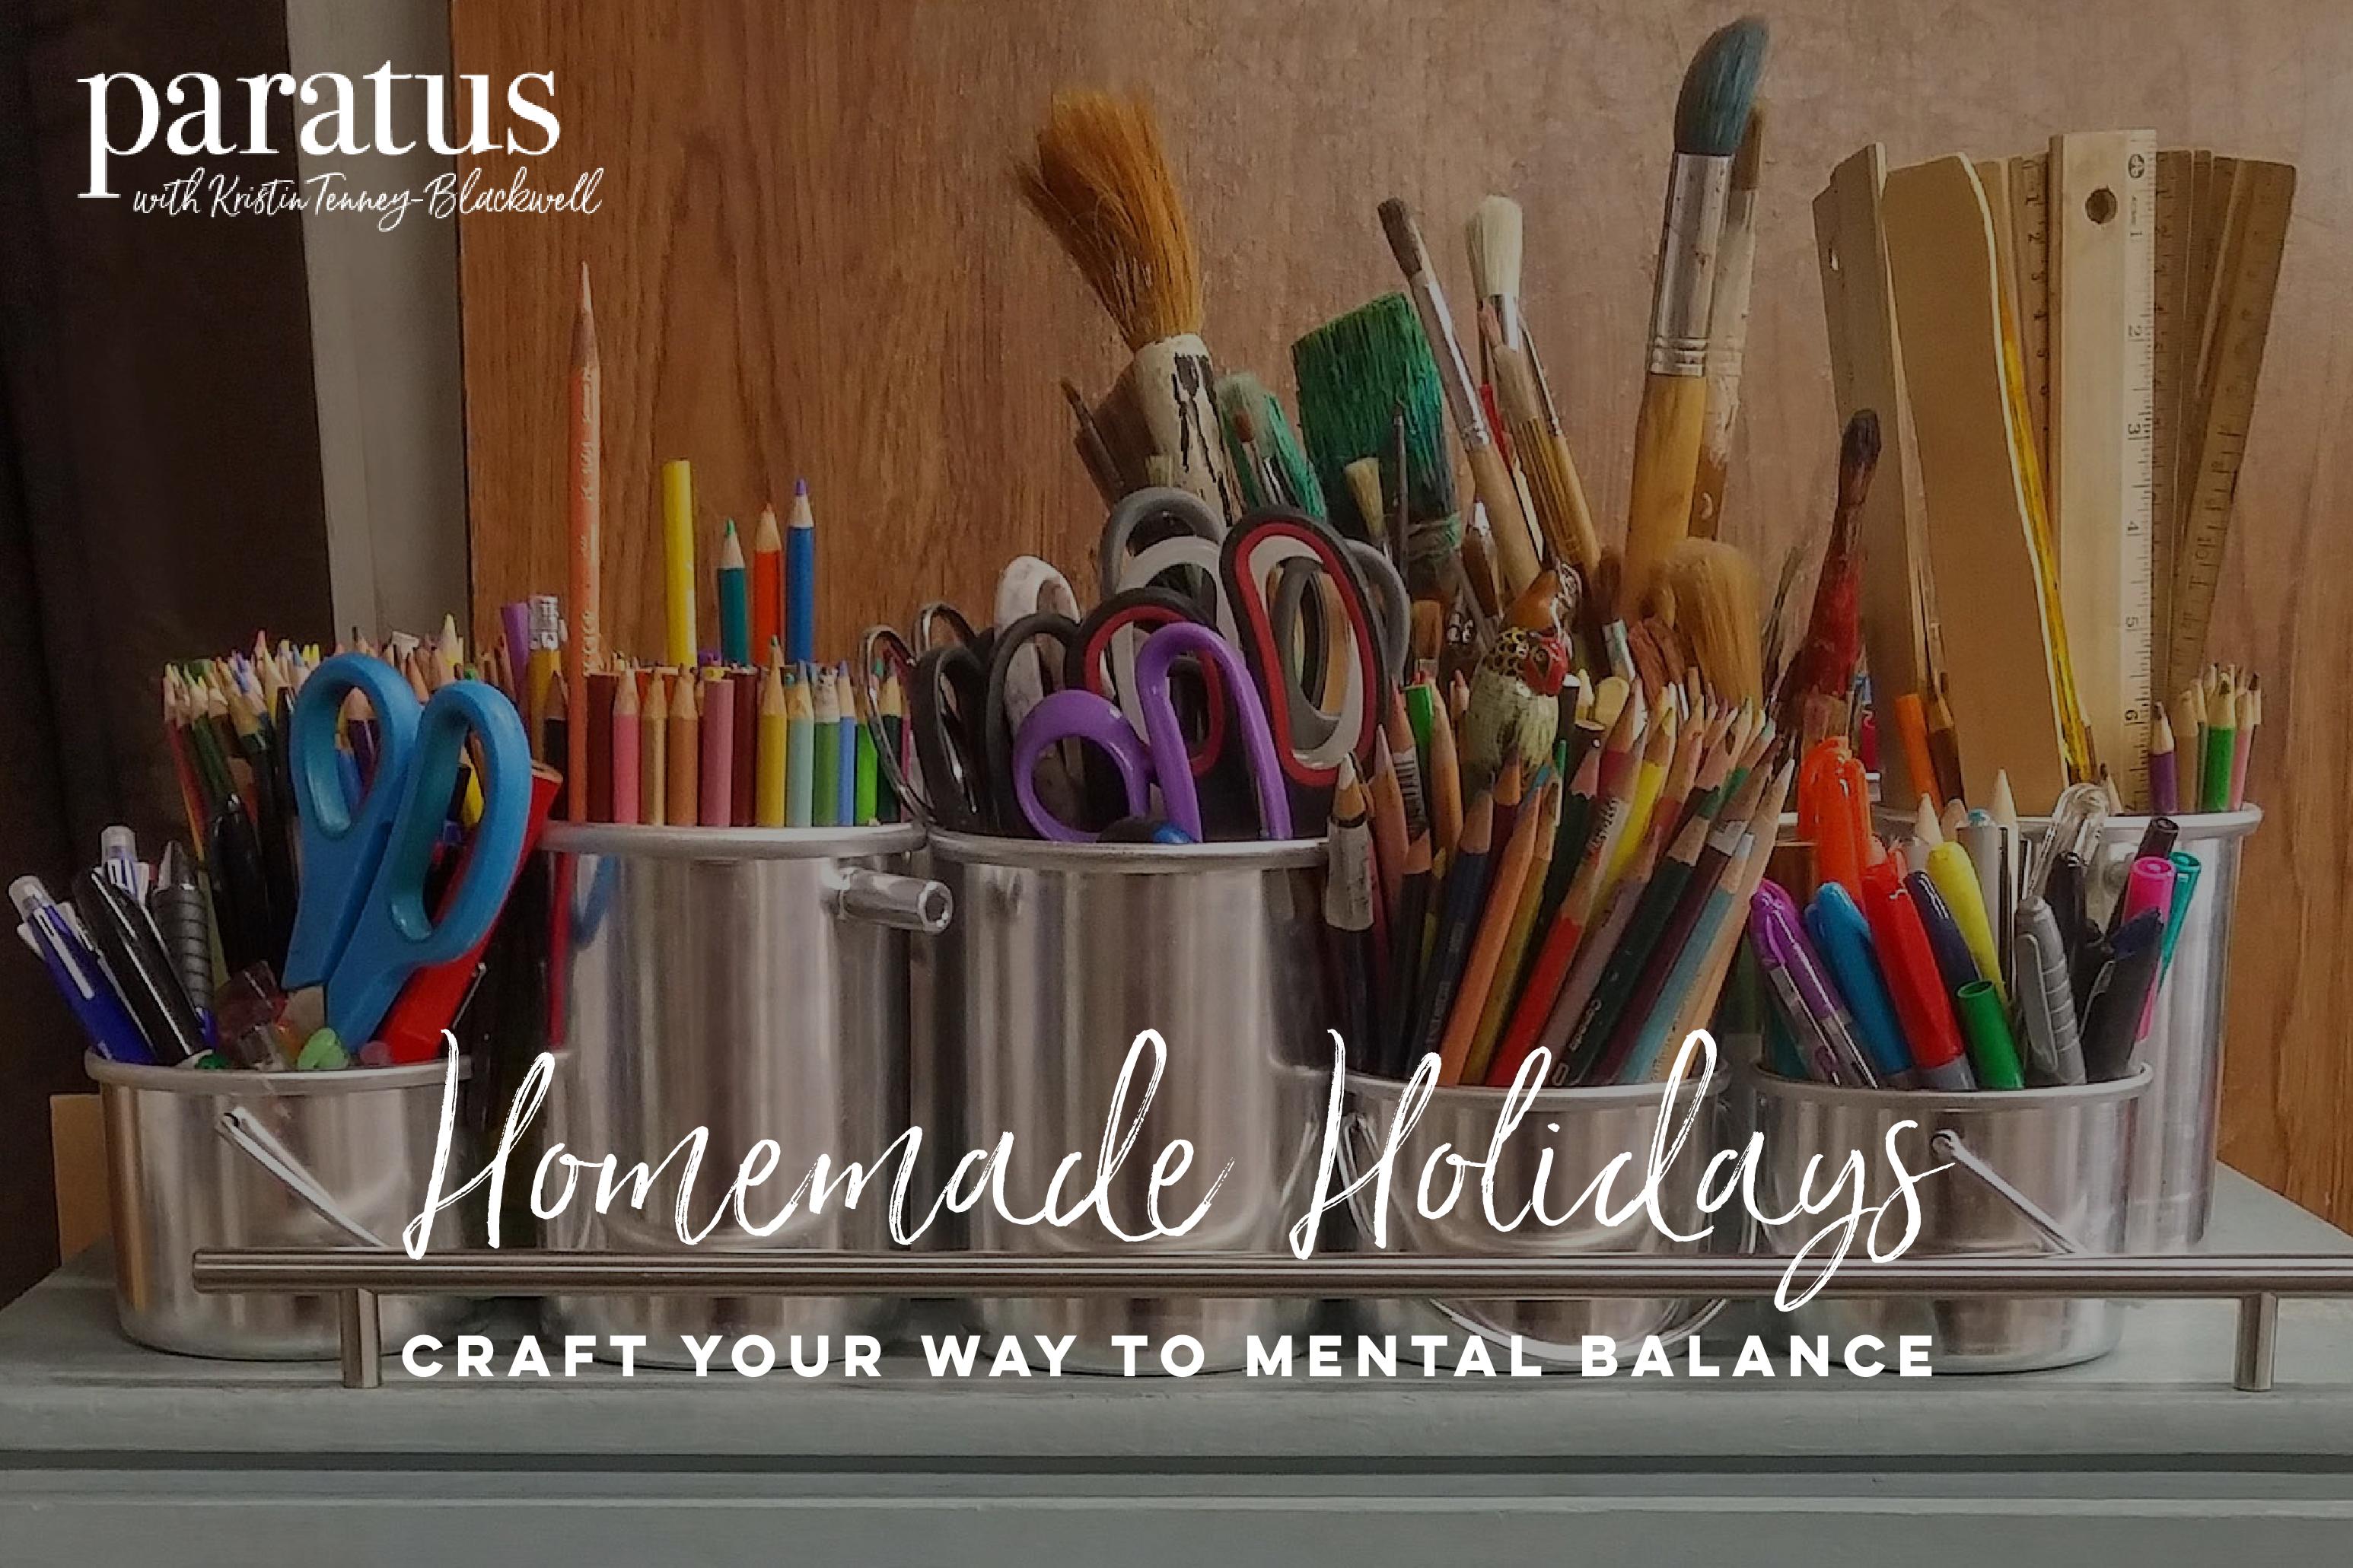 Homemade Holidays - Paratus with Kristin Tenney-Blackwell